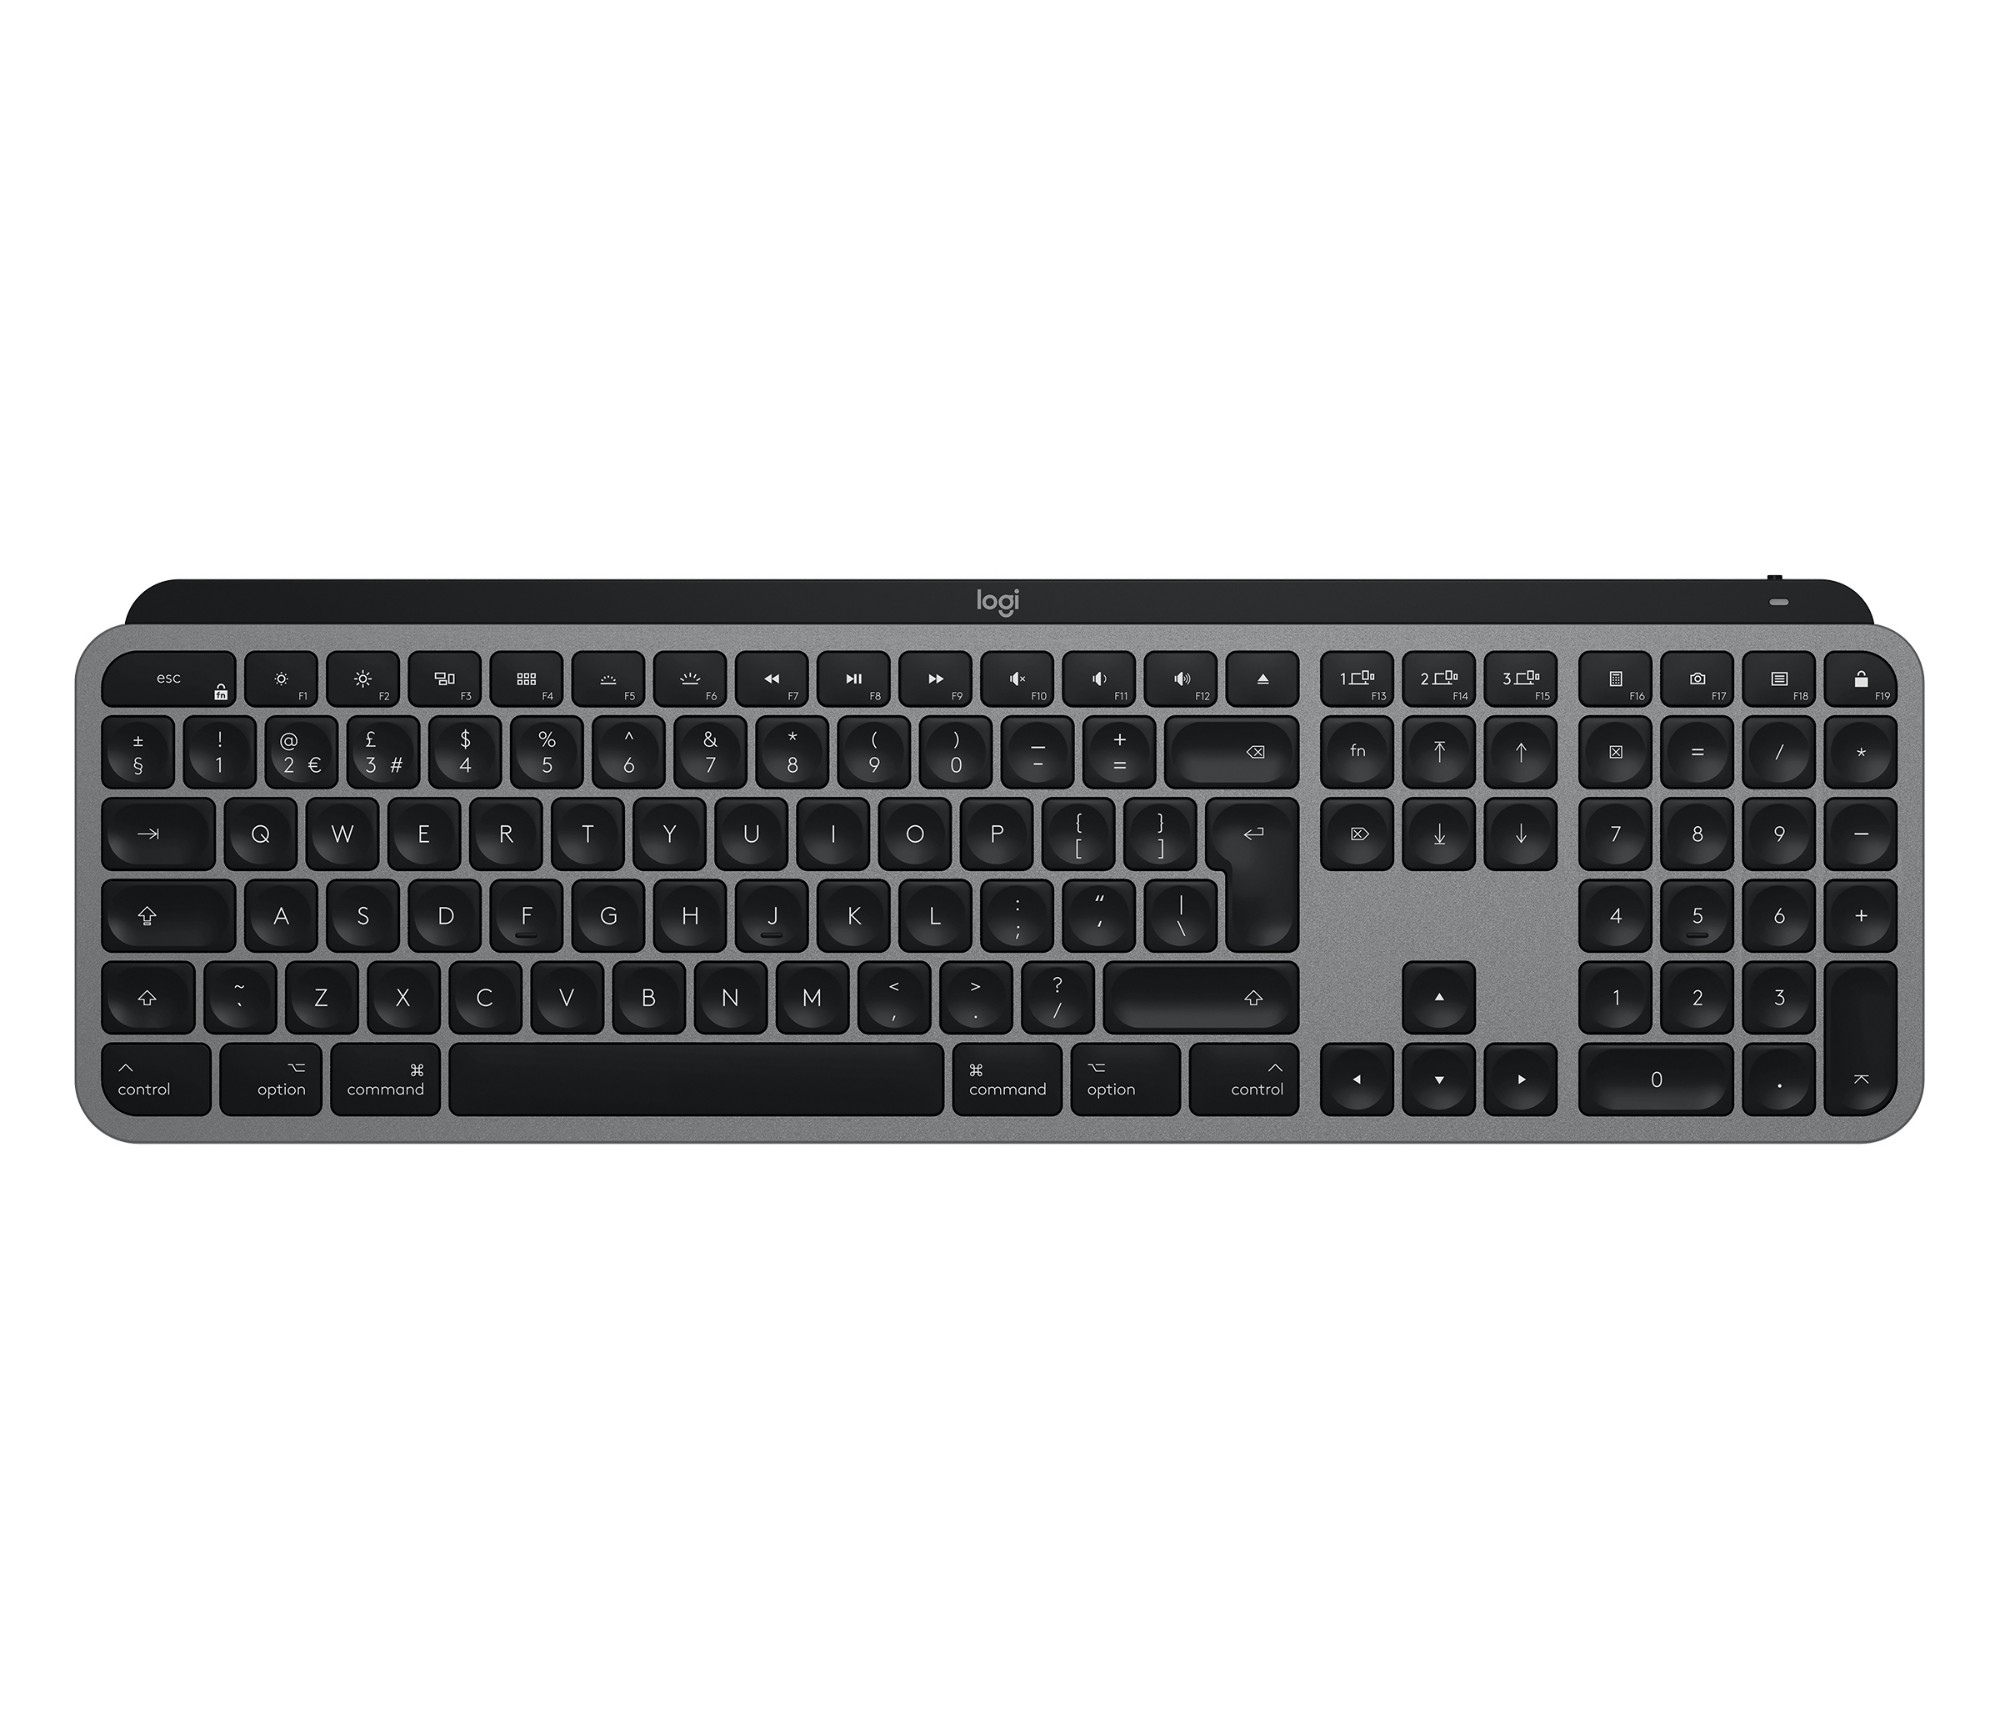 Logitech MX Keys teclado RF Wireless + Bluetooth QWERTY Inglés del Reino Unido Aluminio, Negro